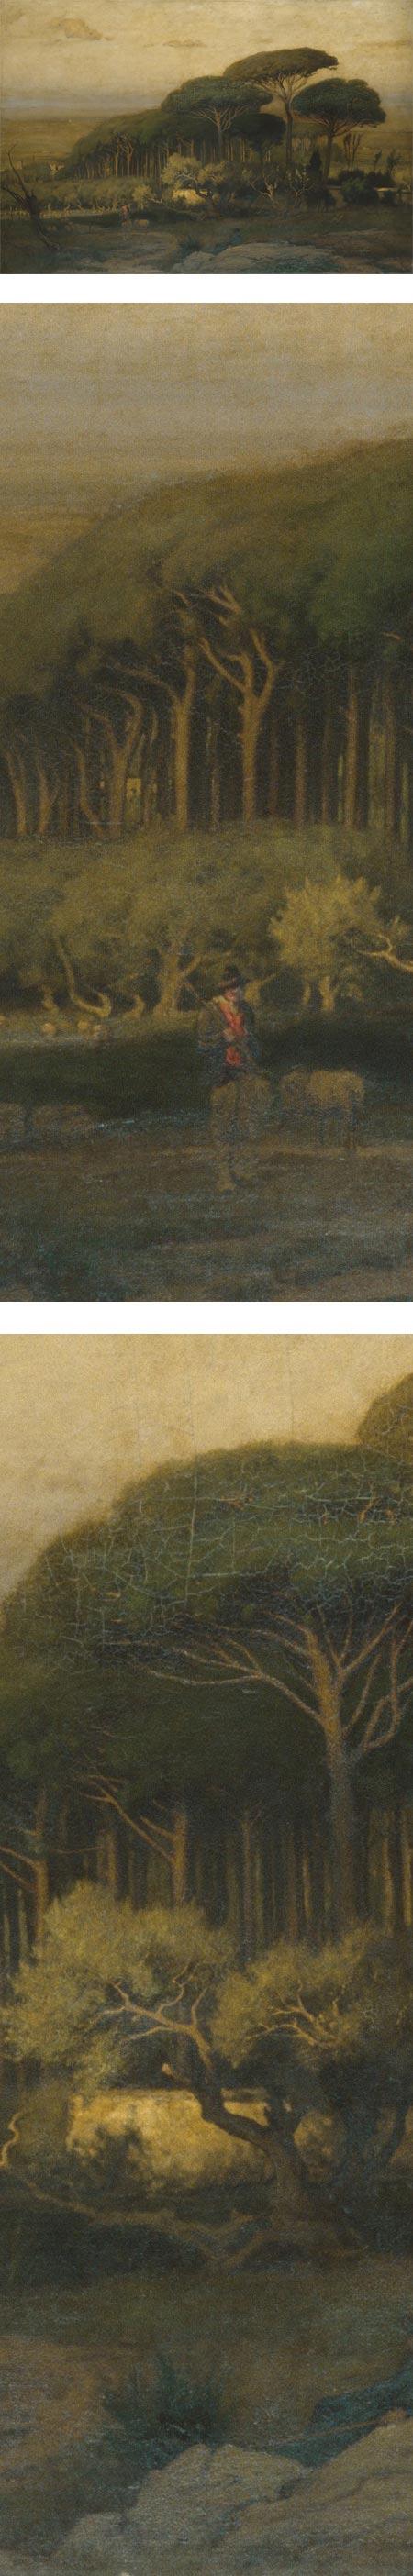 Pine Grove of the Barberini Villa, George Inness